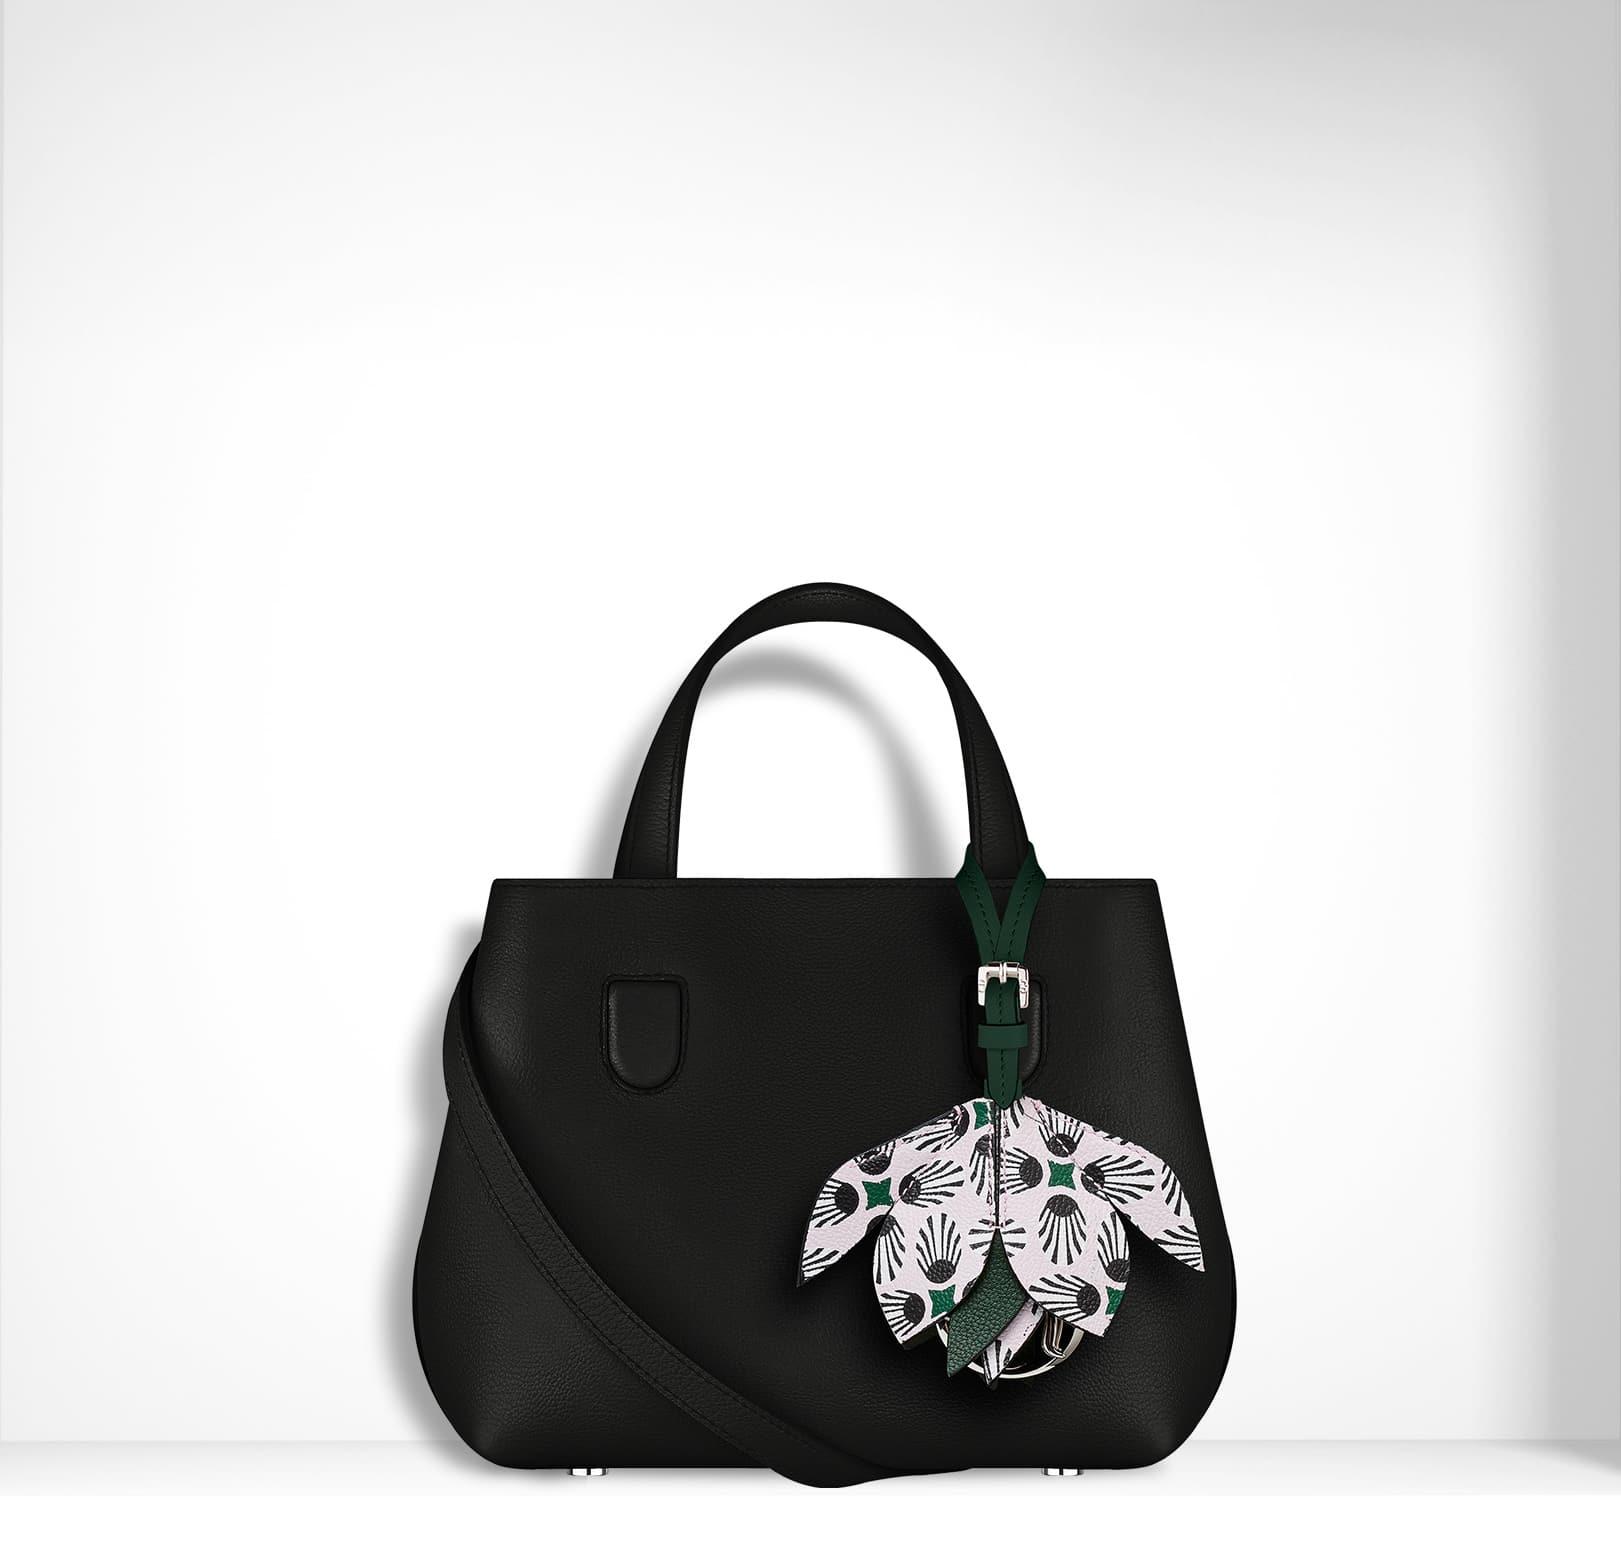 0ae93da7d Dior Fall/Winter 2016 Bag Collection | Spotted Fashion